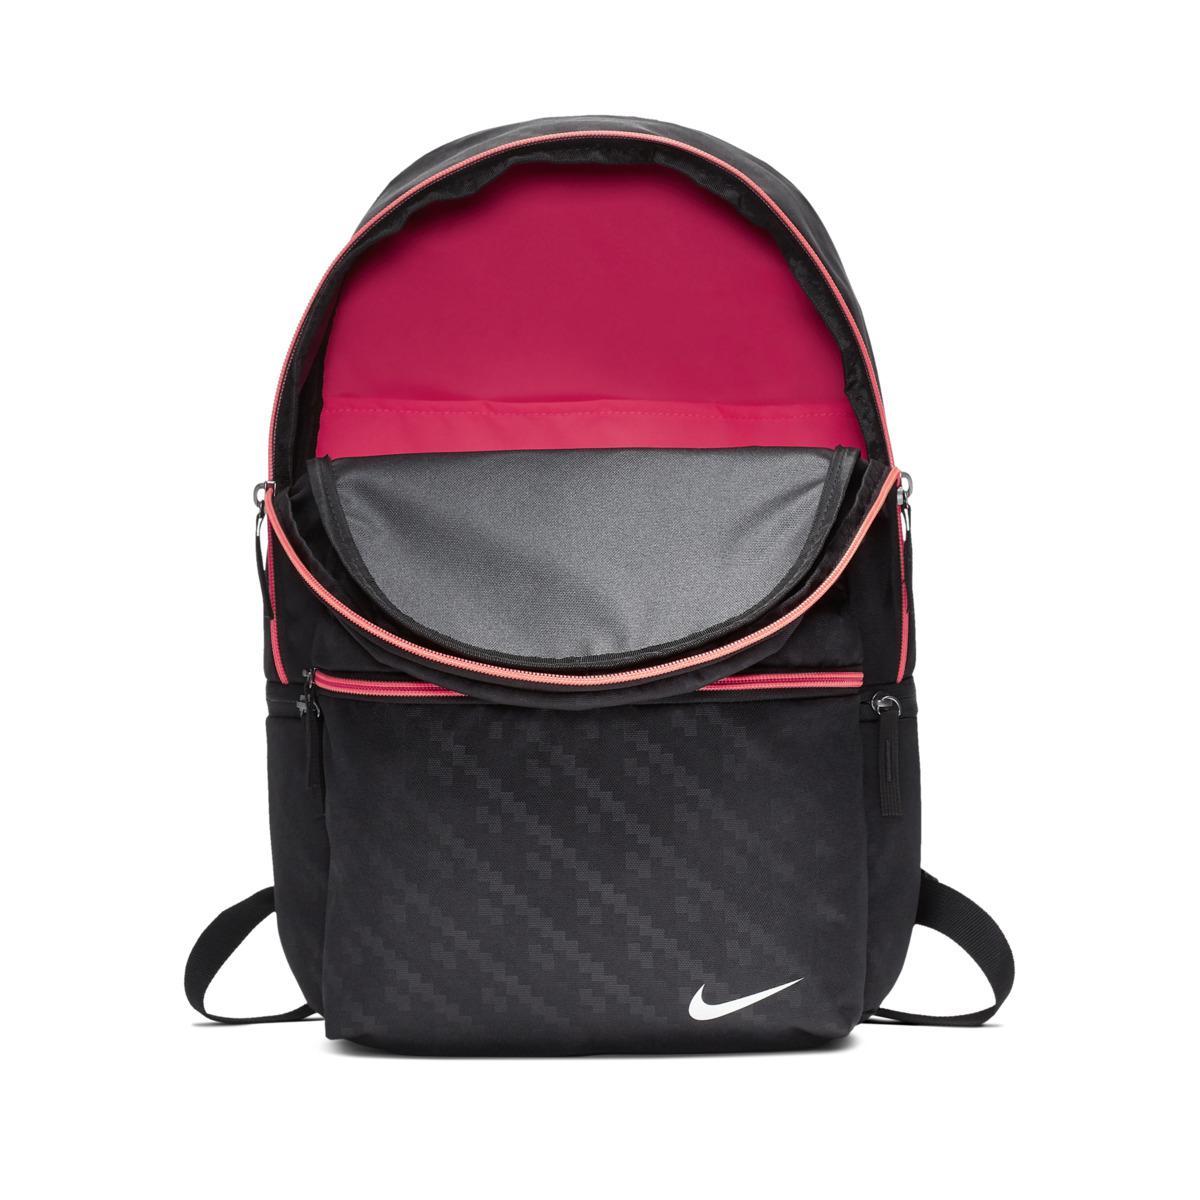 Nike - Black Cr7 Junior Backpack for Men - Lyst. View fullscreen 36a87b2fa0366